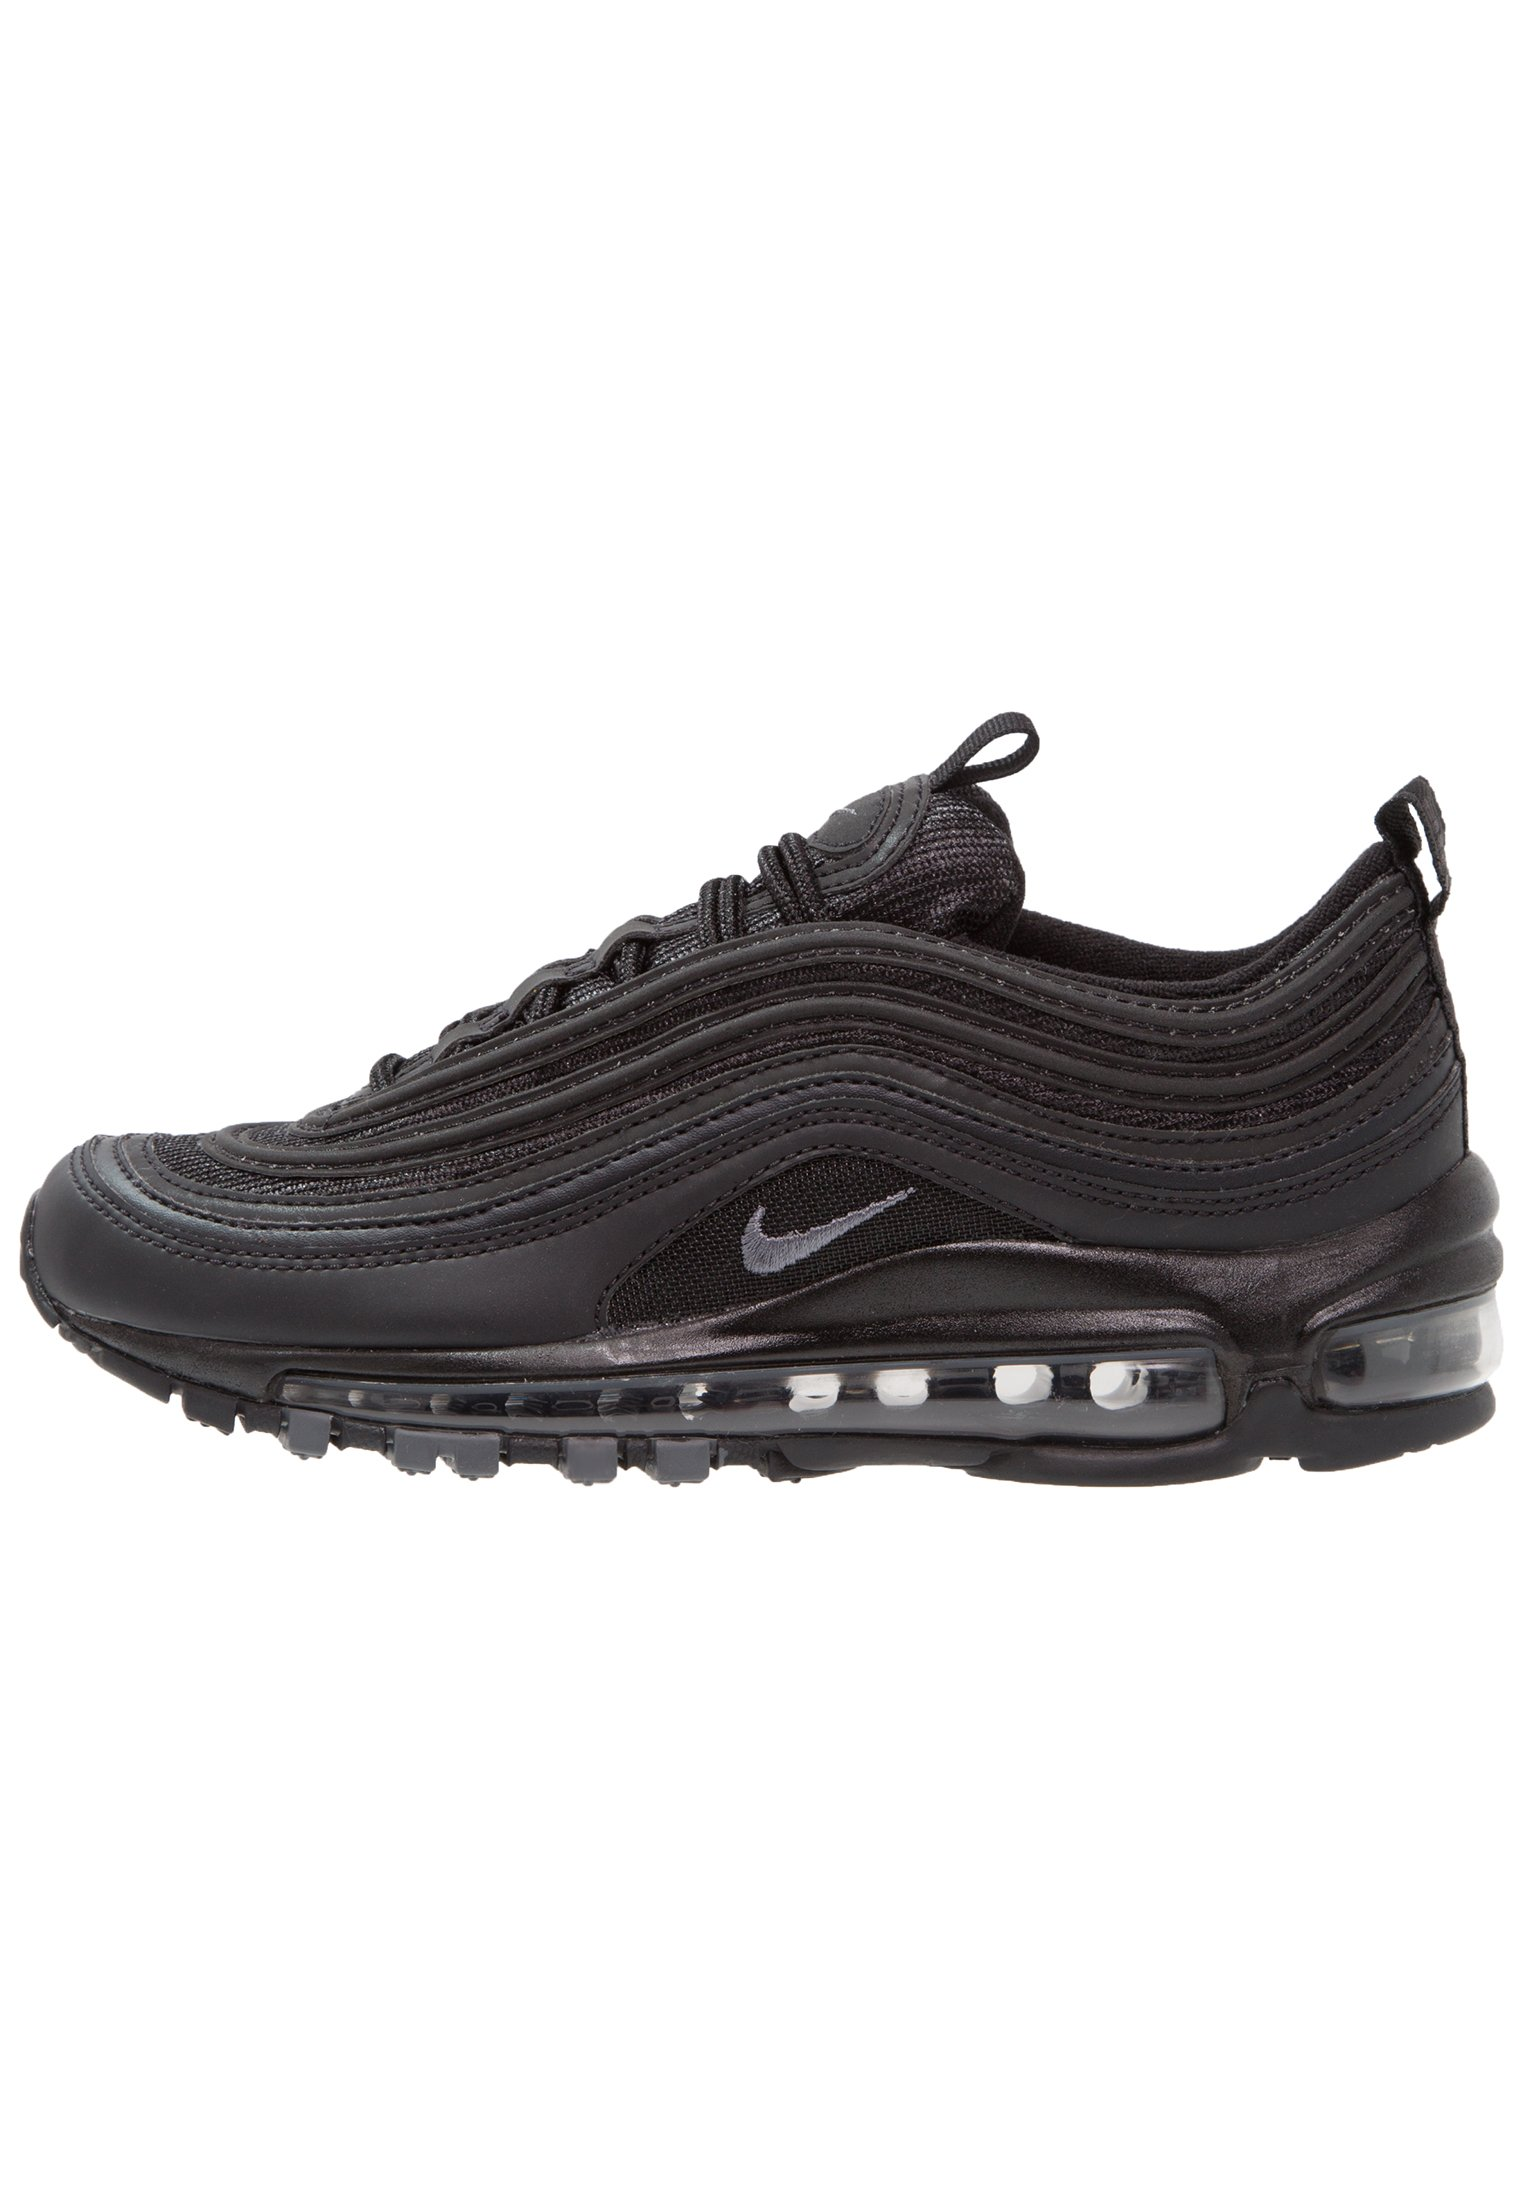 Sneakers | NIKE AIR MAX 97 BlackDark Grey | Nike Donna